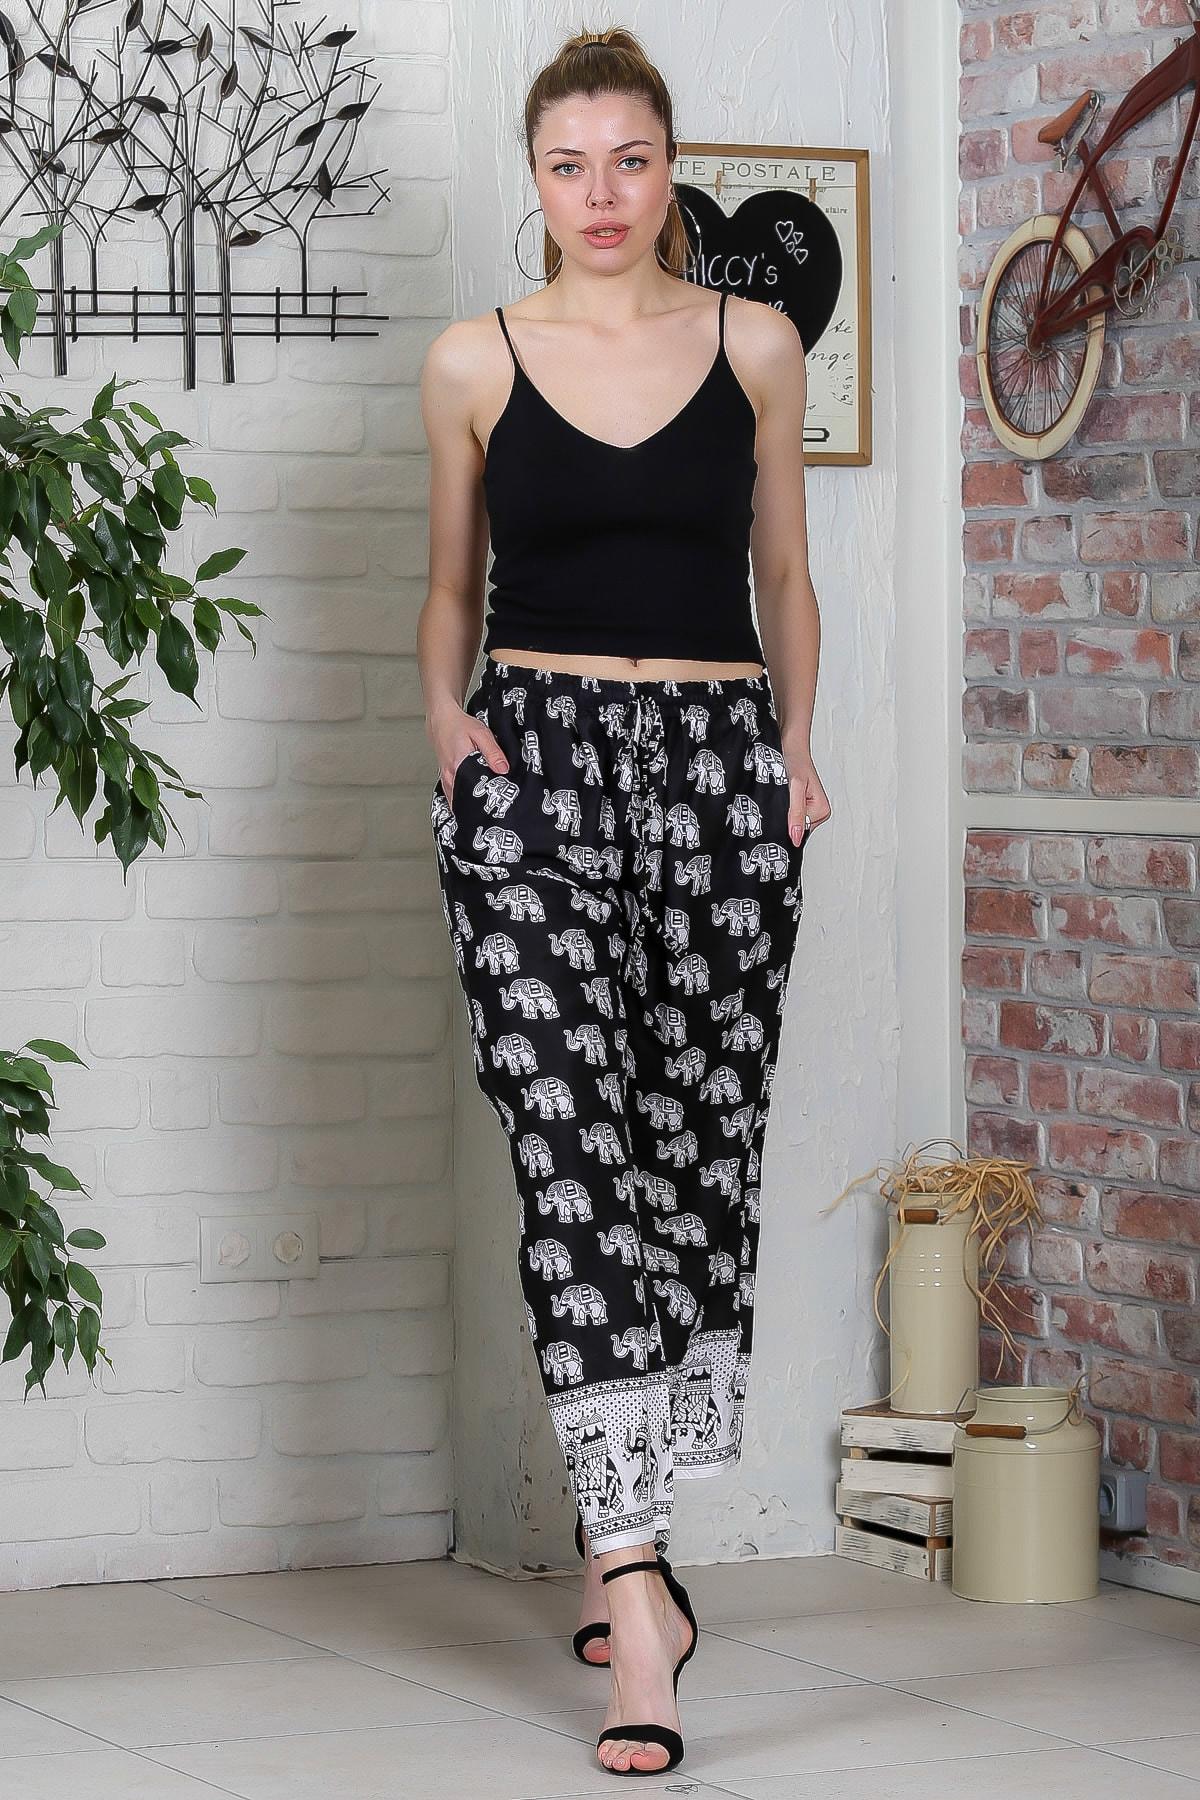 Chiccy Kadın Siyah Fil Desenli Cep Detaylı Dokuma Pantolon M10060000PN98900 2